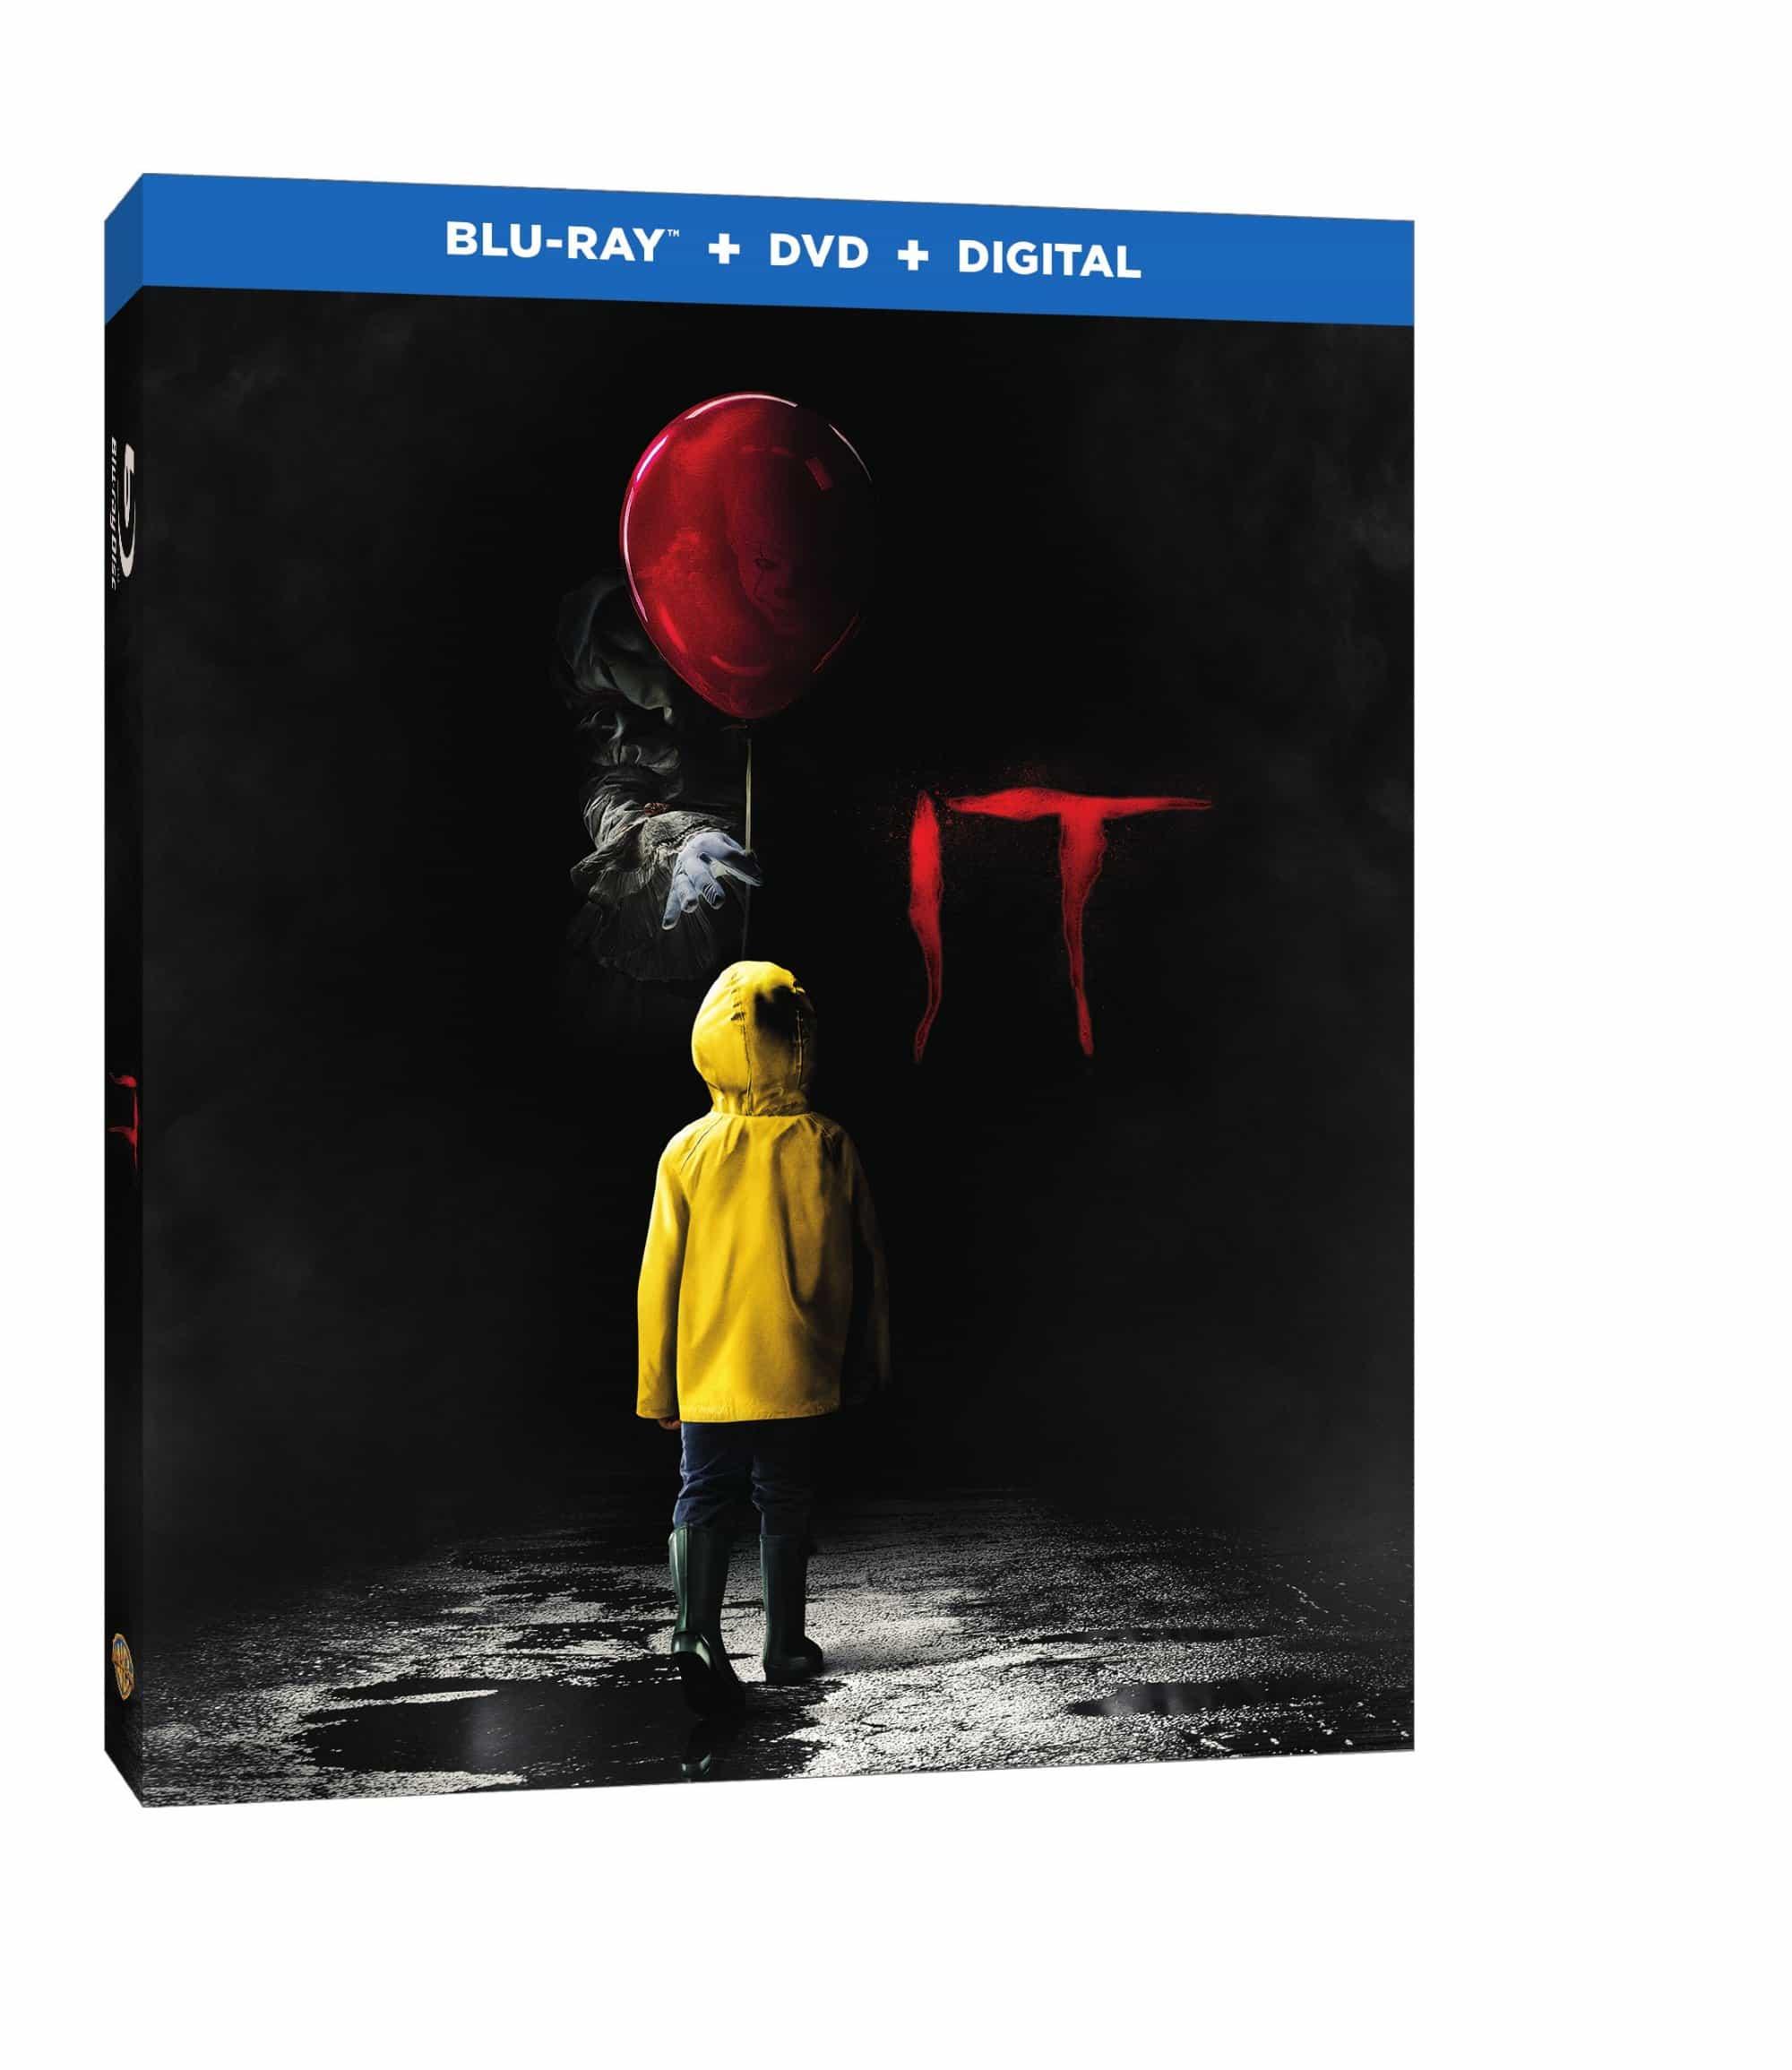 IT_3D Bluray DVD Cover